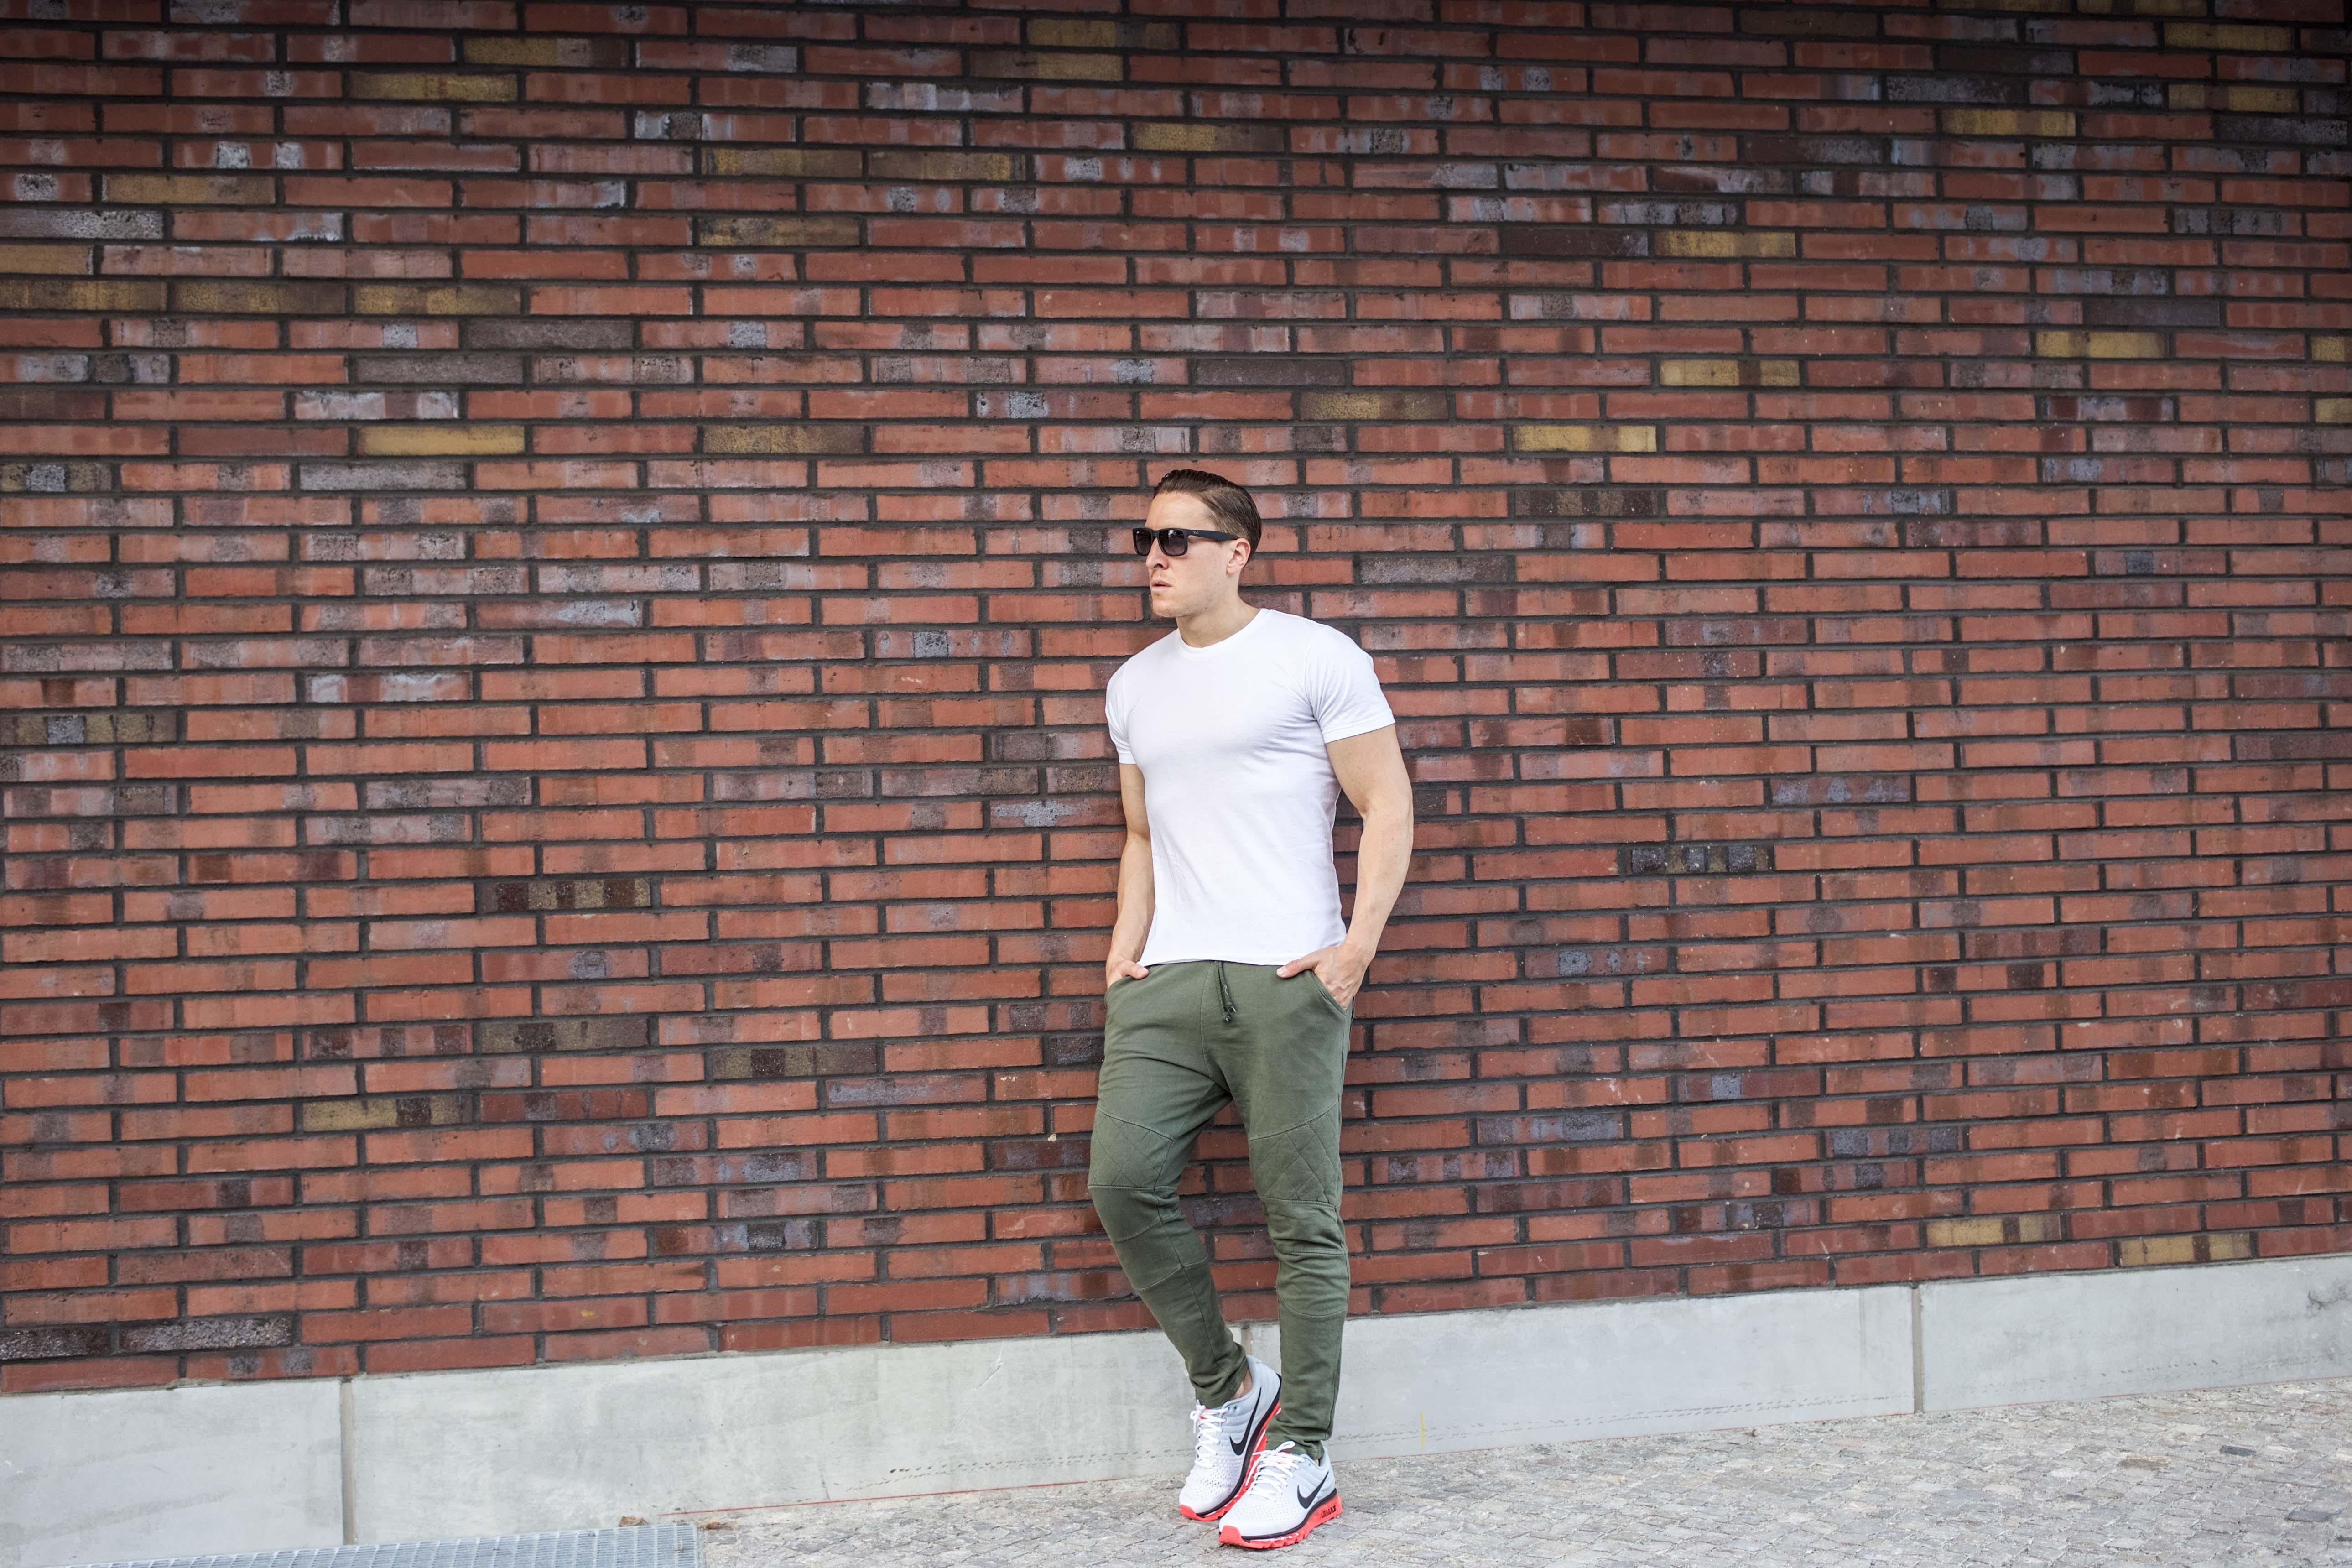 nike-air-max-2017-berlin-outfit-modeblog-lässiger-street-style-männerblog_6569